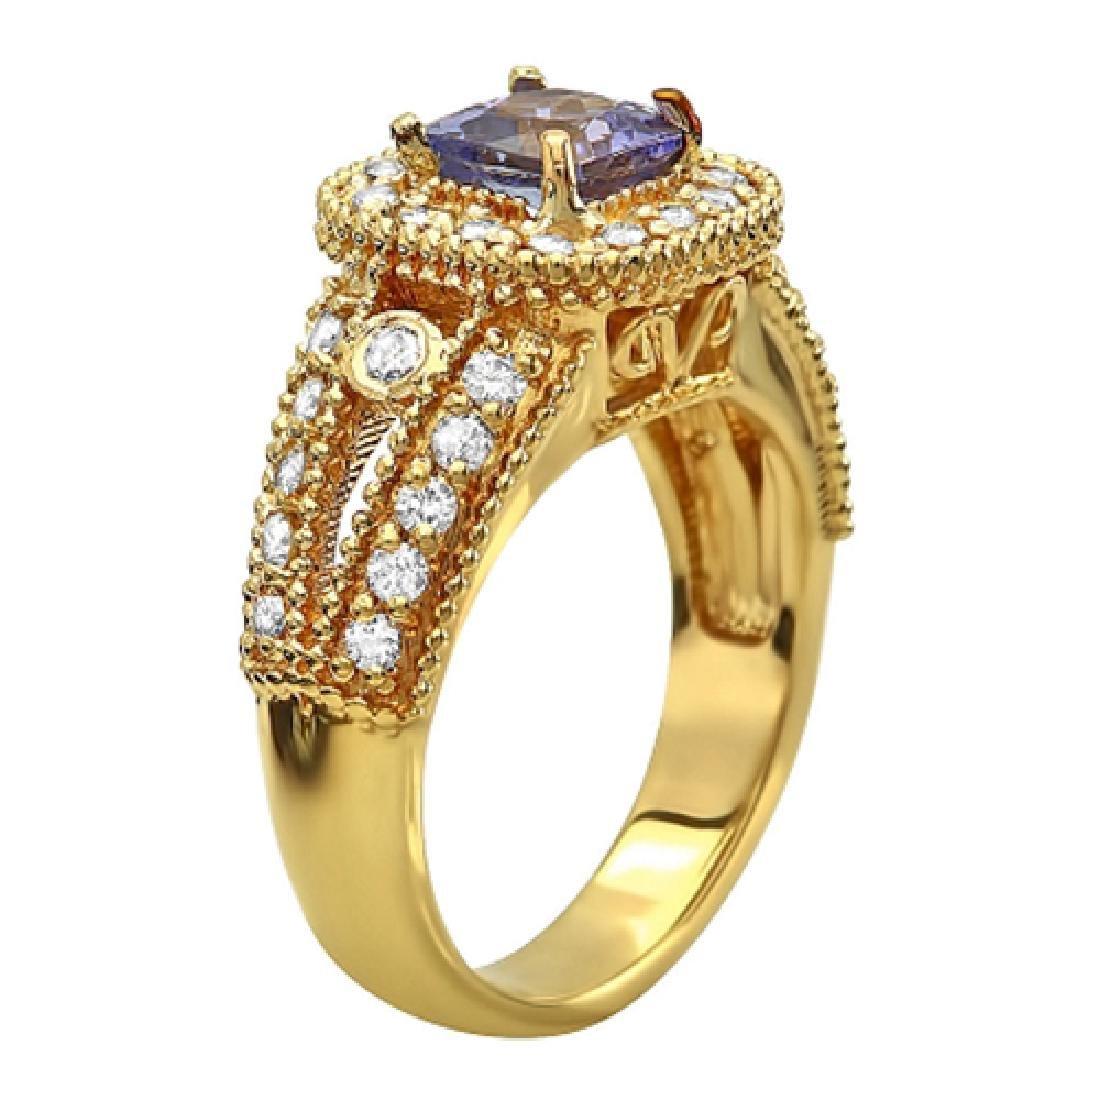 1.80 Carat Natural Tanzanite 18K Solid Yellow Gold Ring - 2